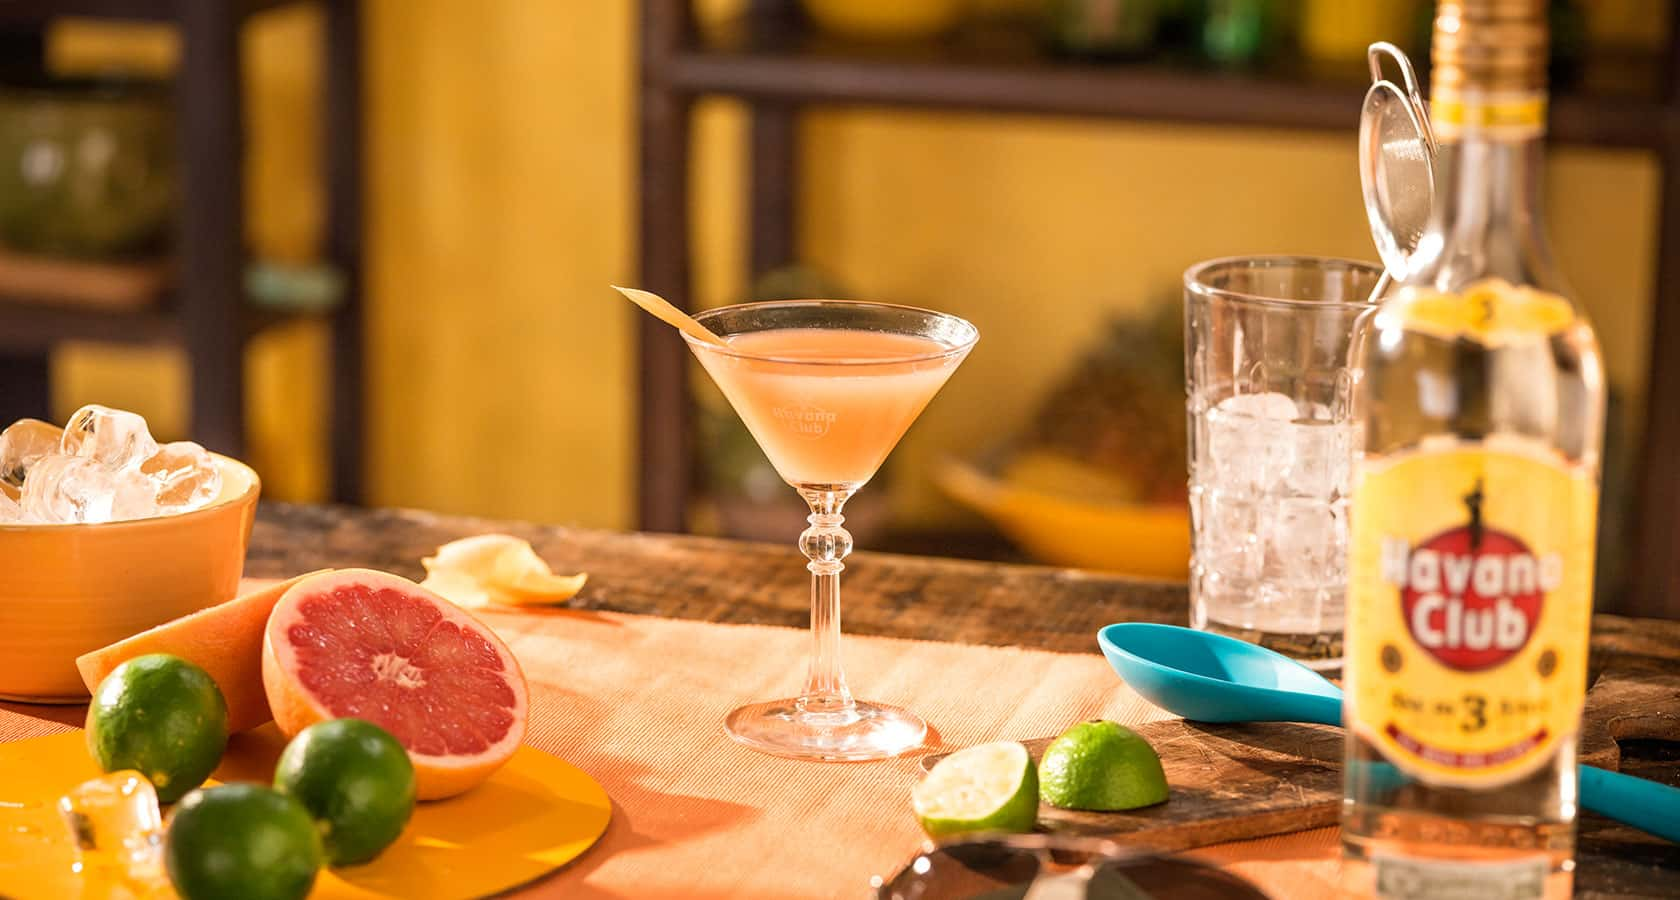 The Havana Club Boomerang - Drink Me